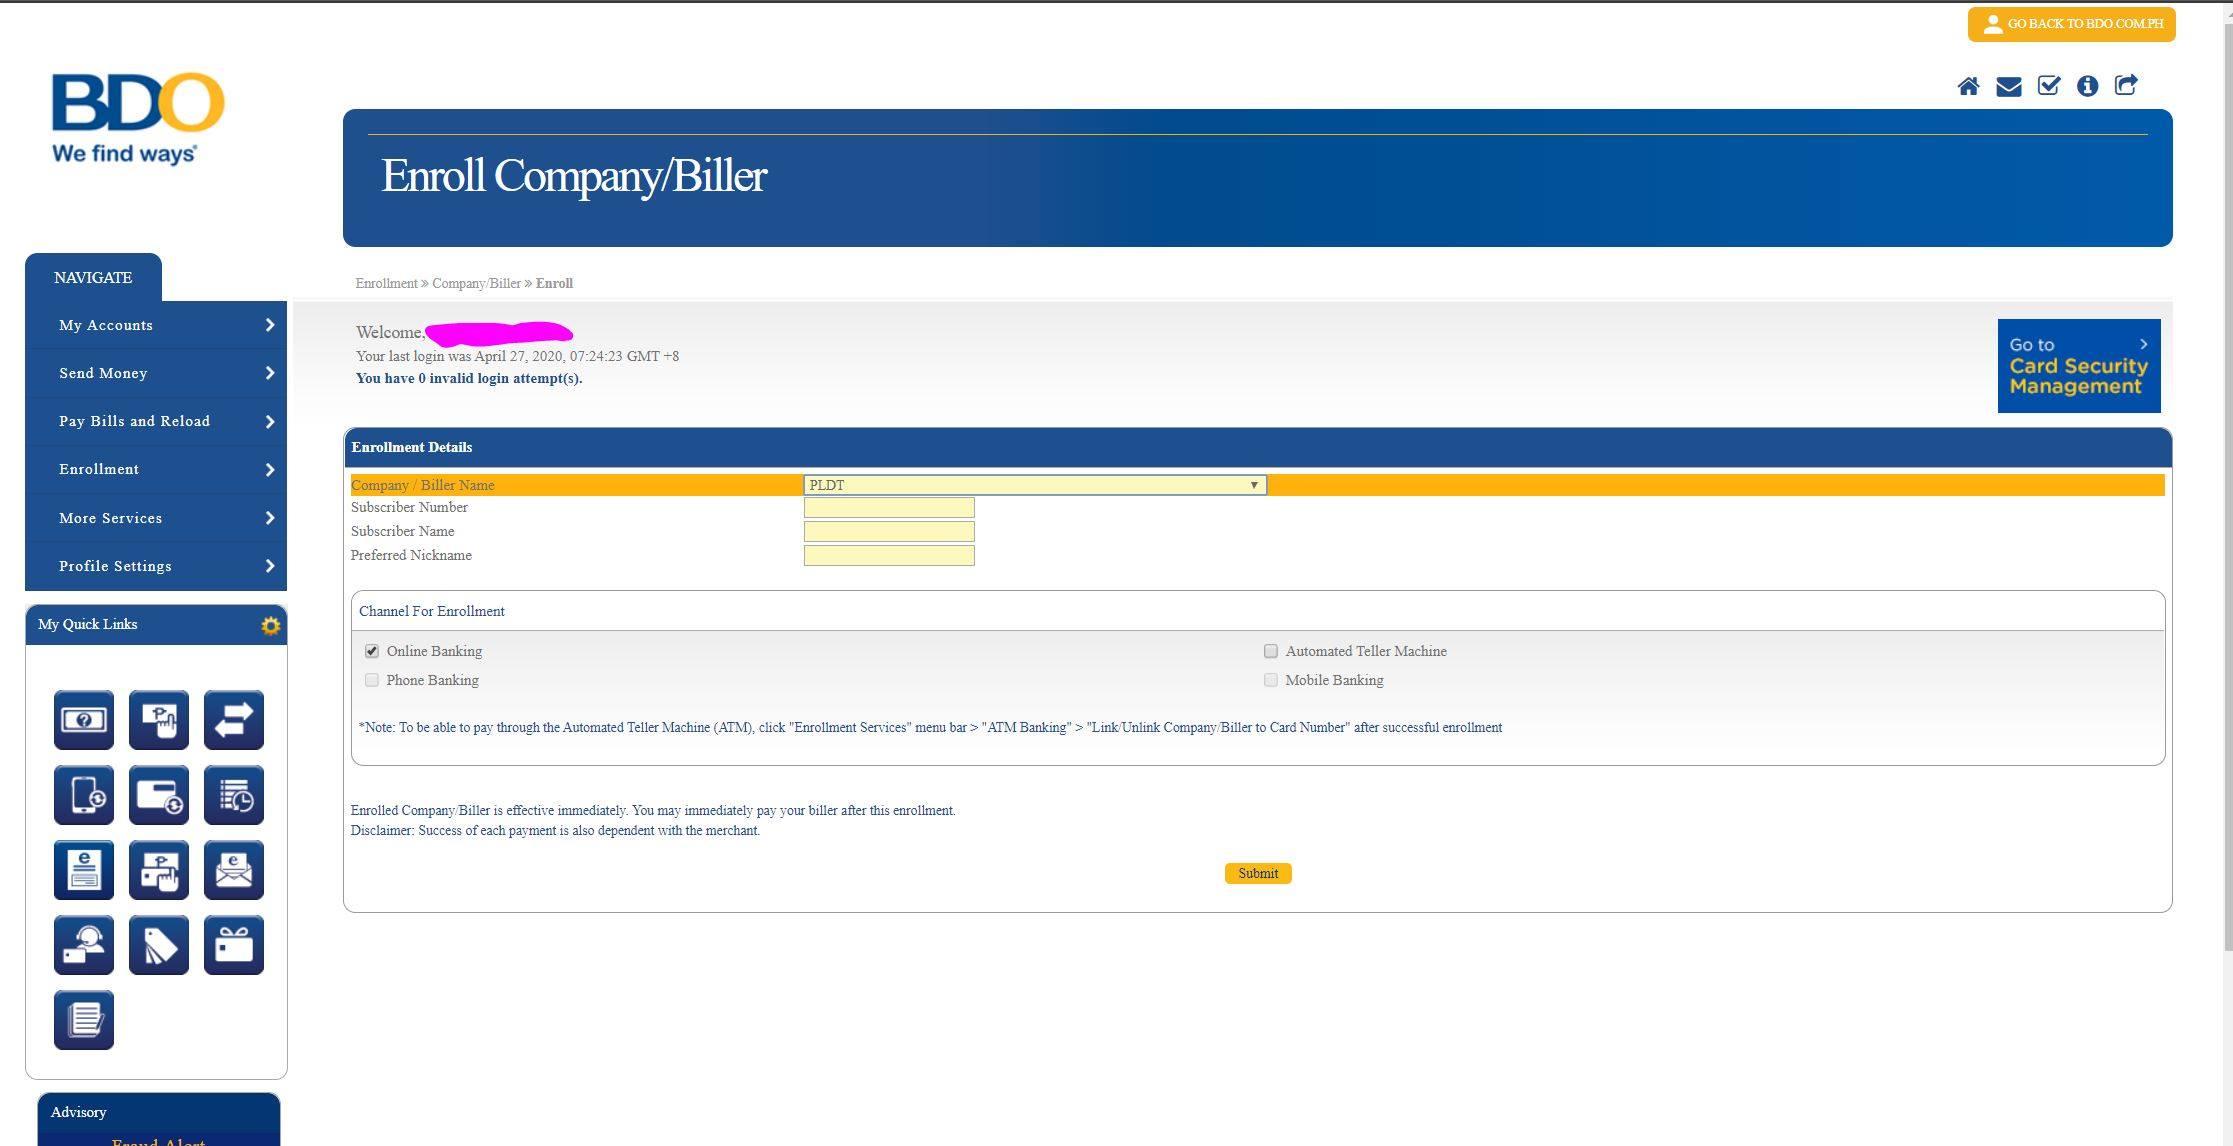 how-to-pay-pldt-dsl-fiber-telephone-via-bdo-online-banking-mobile-phone-pc-website